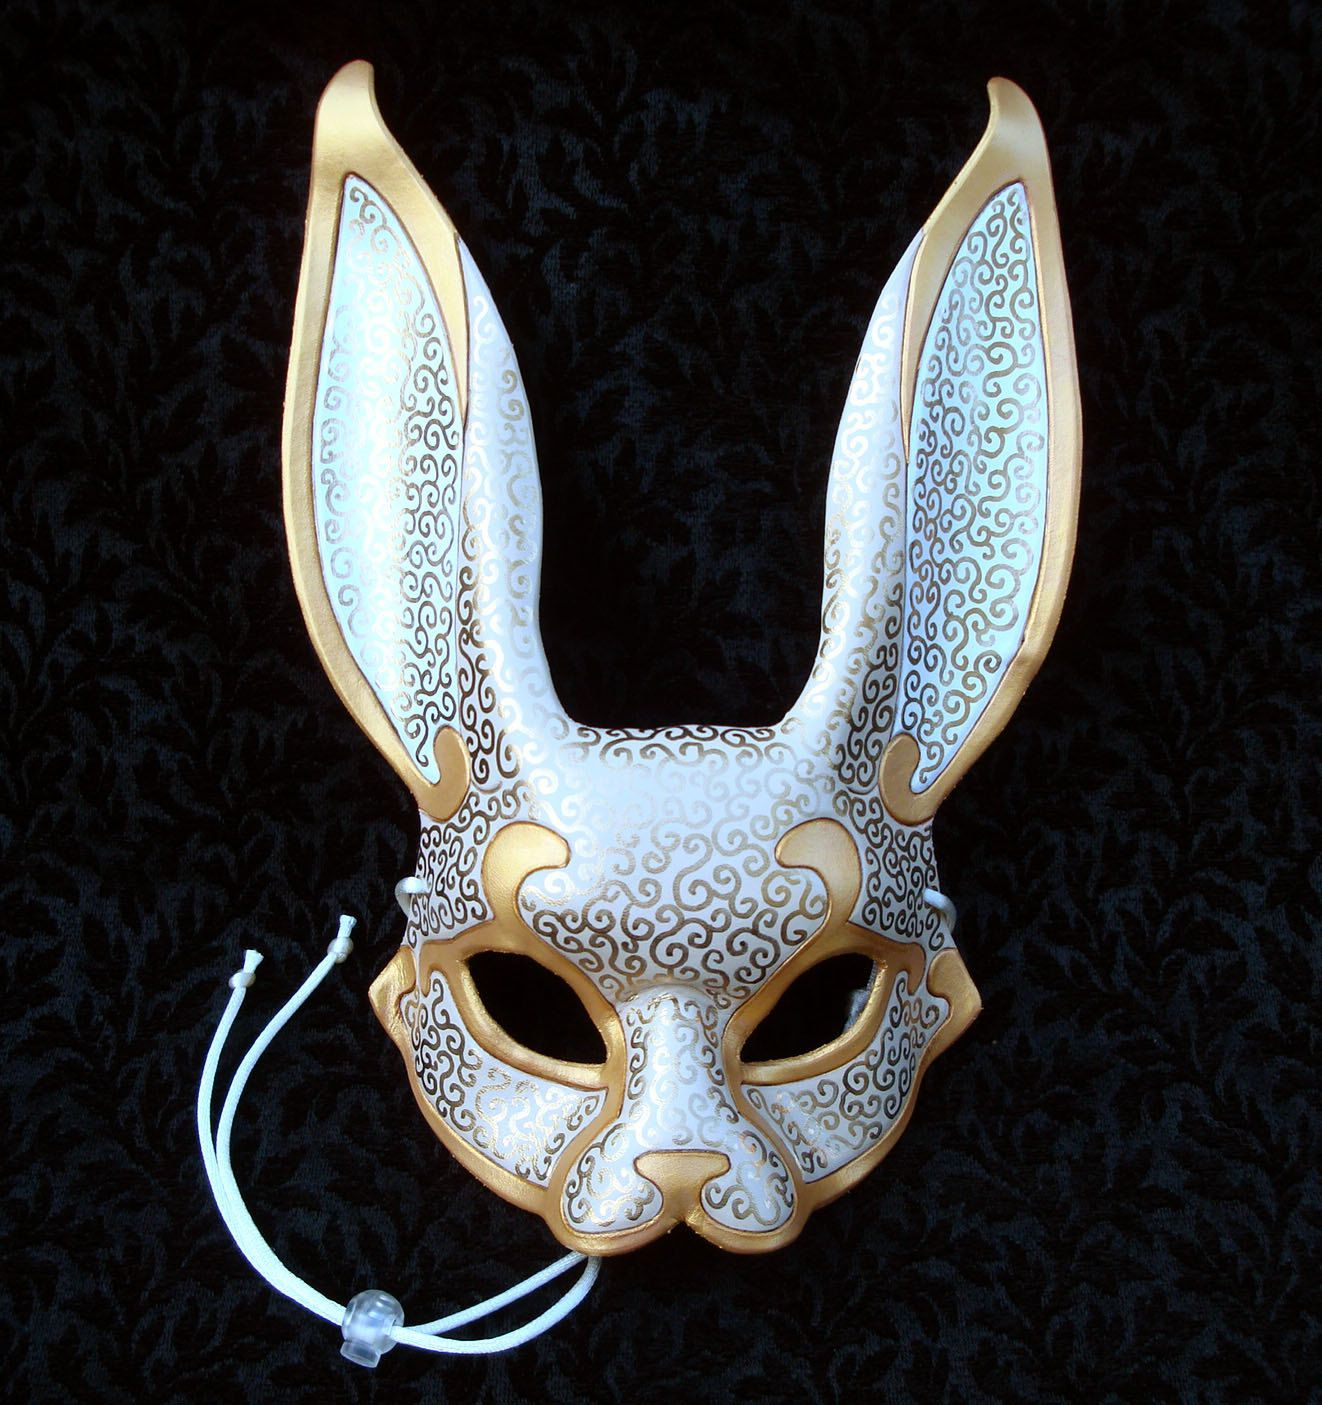 mask by Andrea Masse-Tognetti - merimask on artnet - www.merimask ...